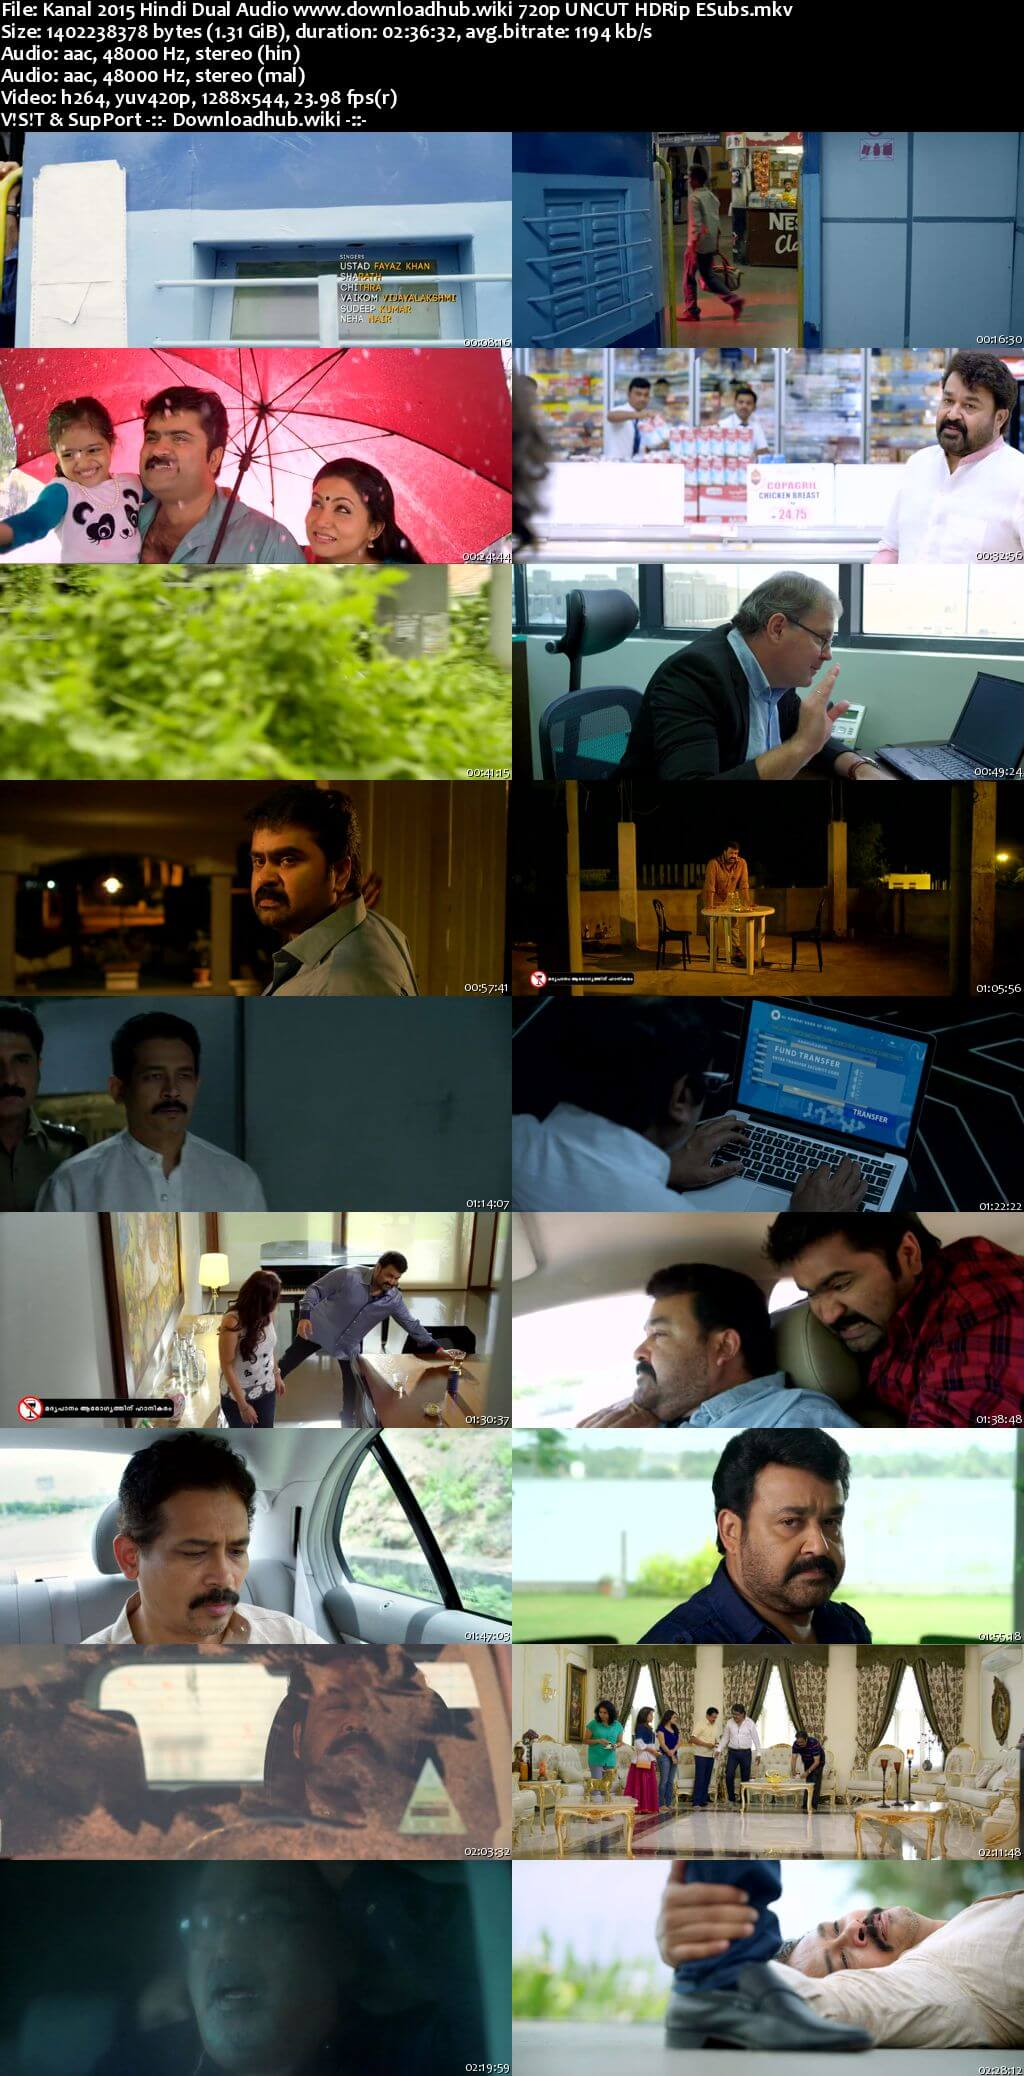 Kanal 2015 Hindi Dual Audio 720p UNCUT HDRip ESubs